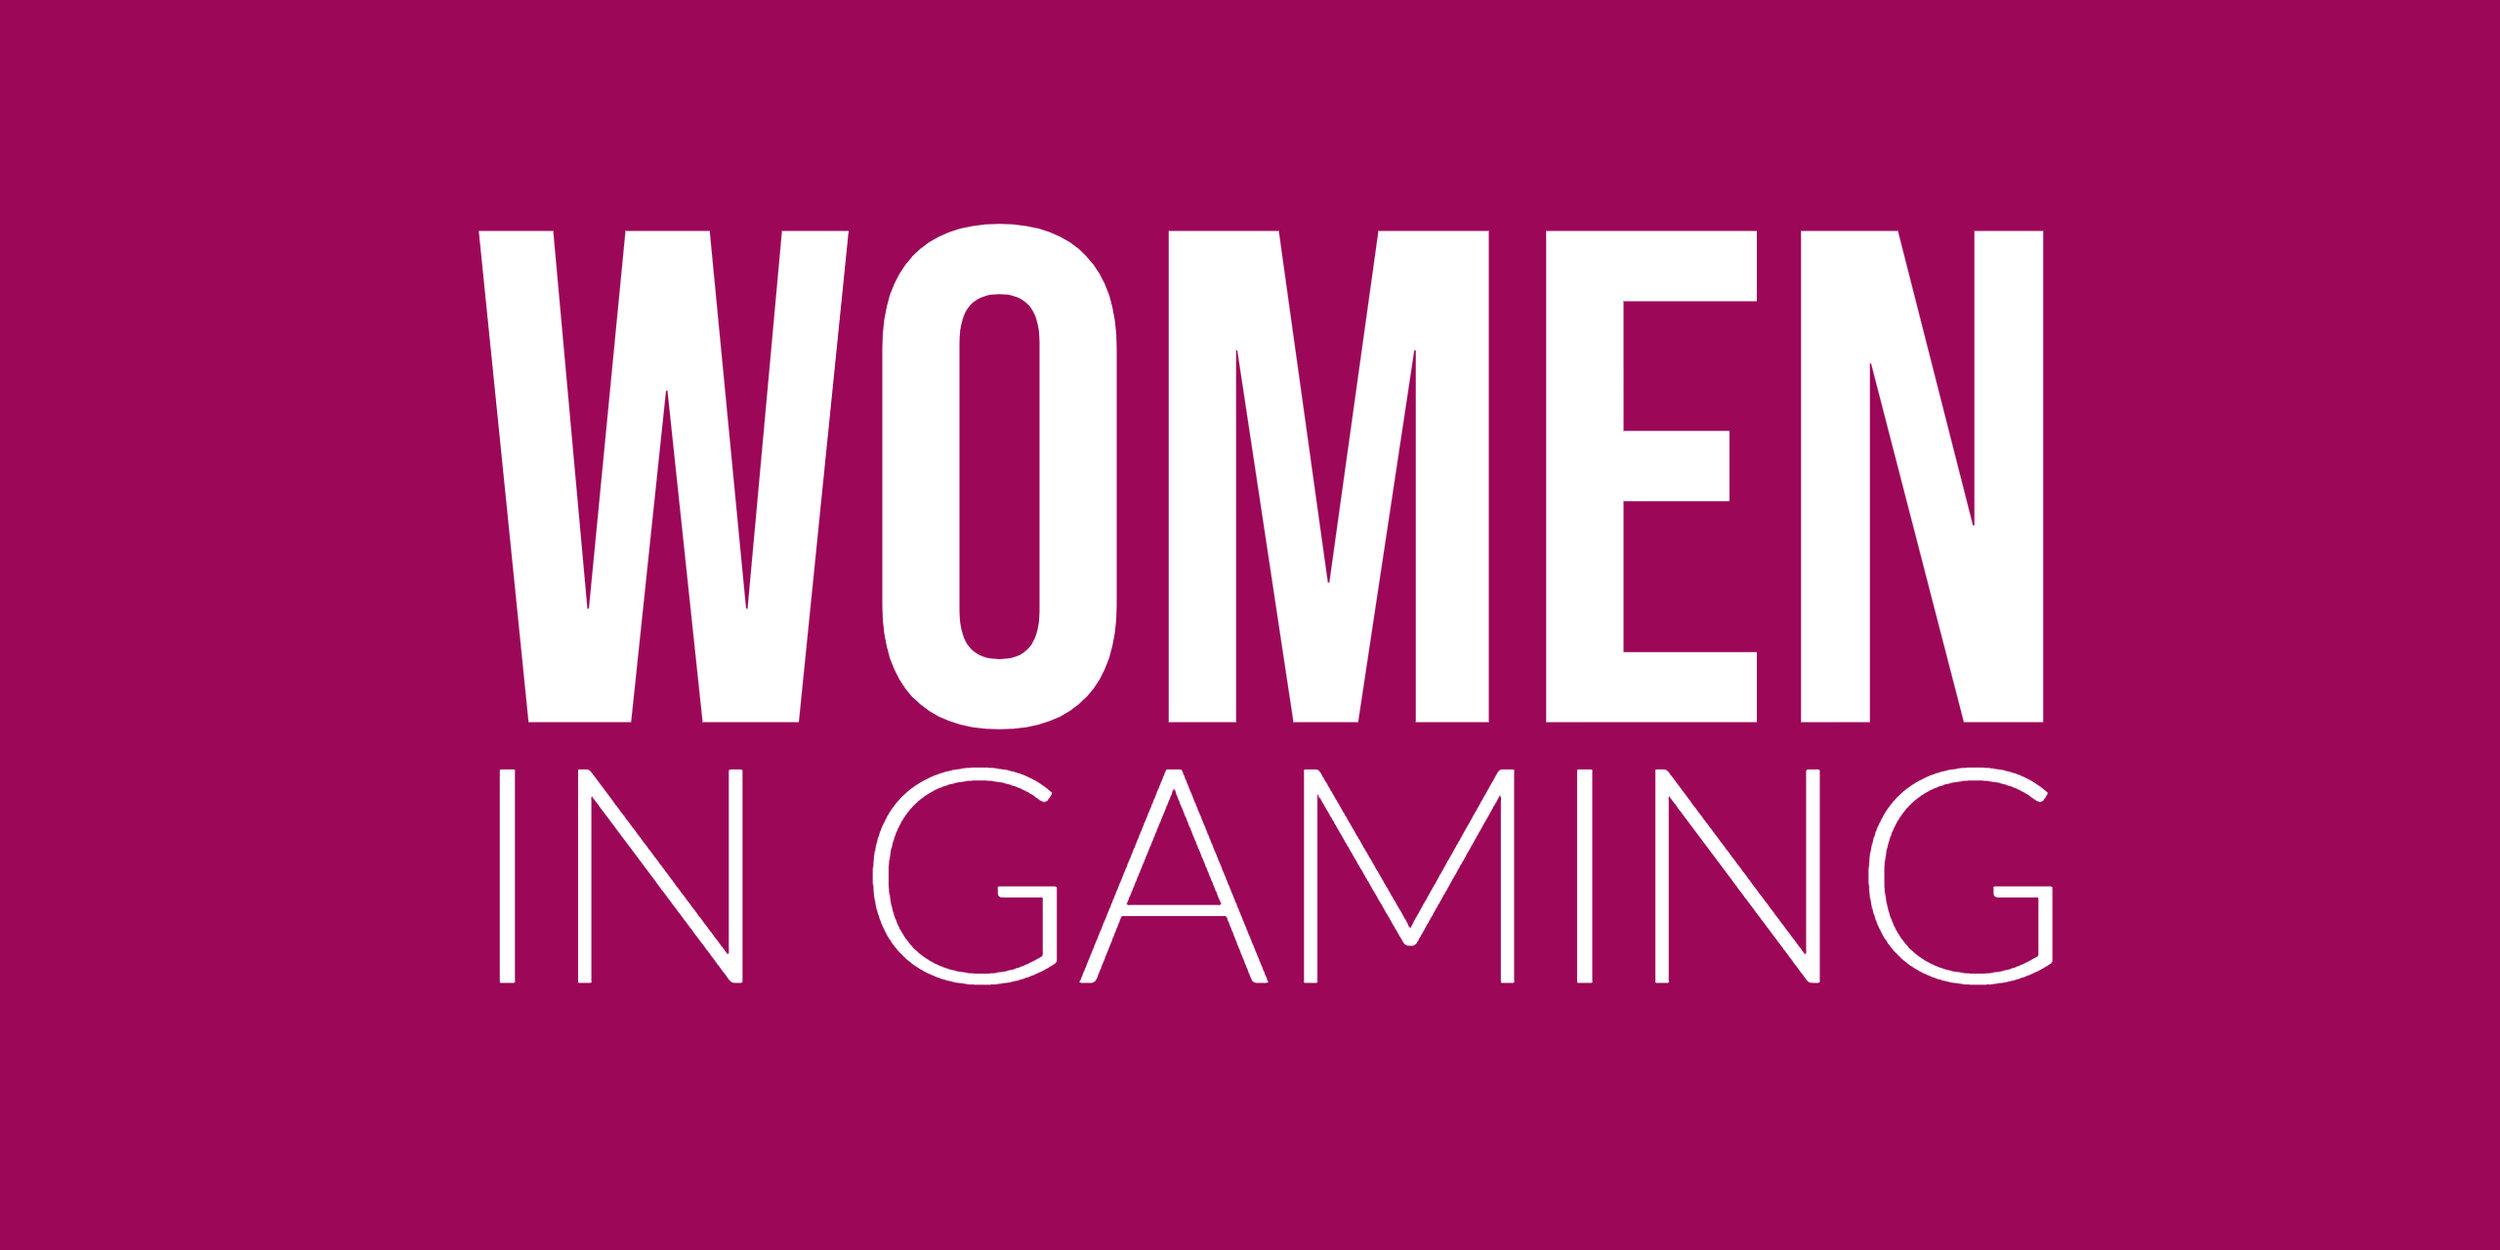 Women in Gaming Main header.jpg